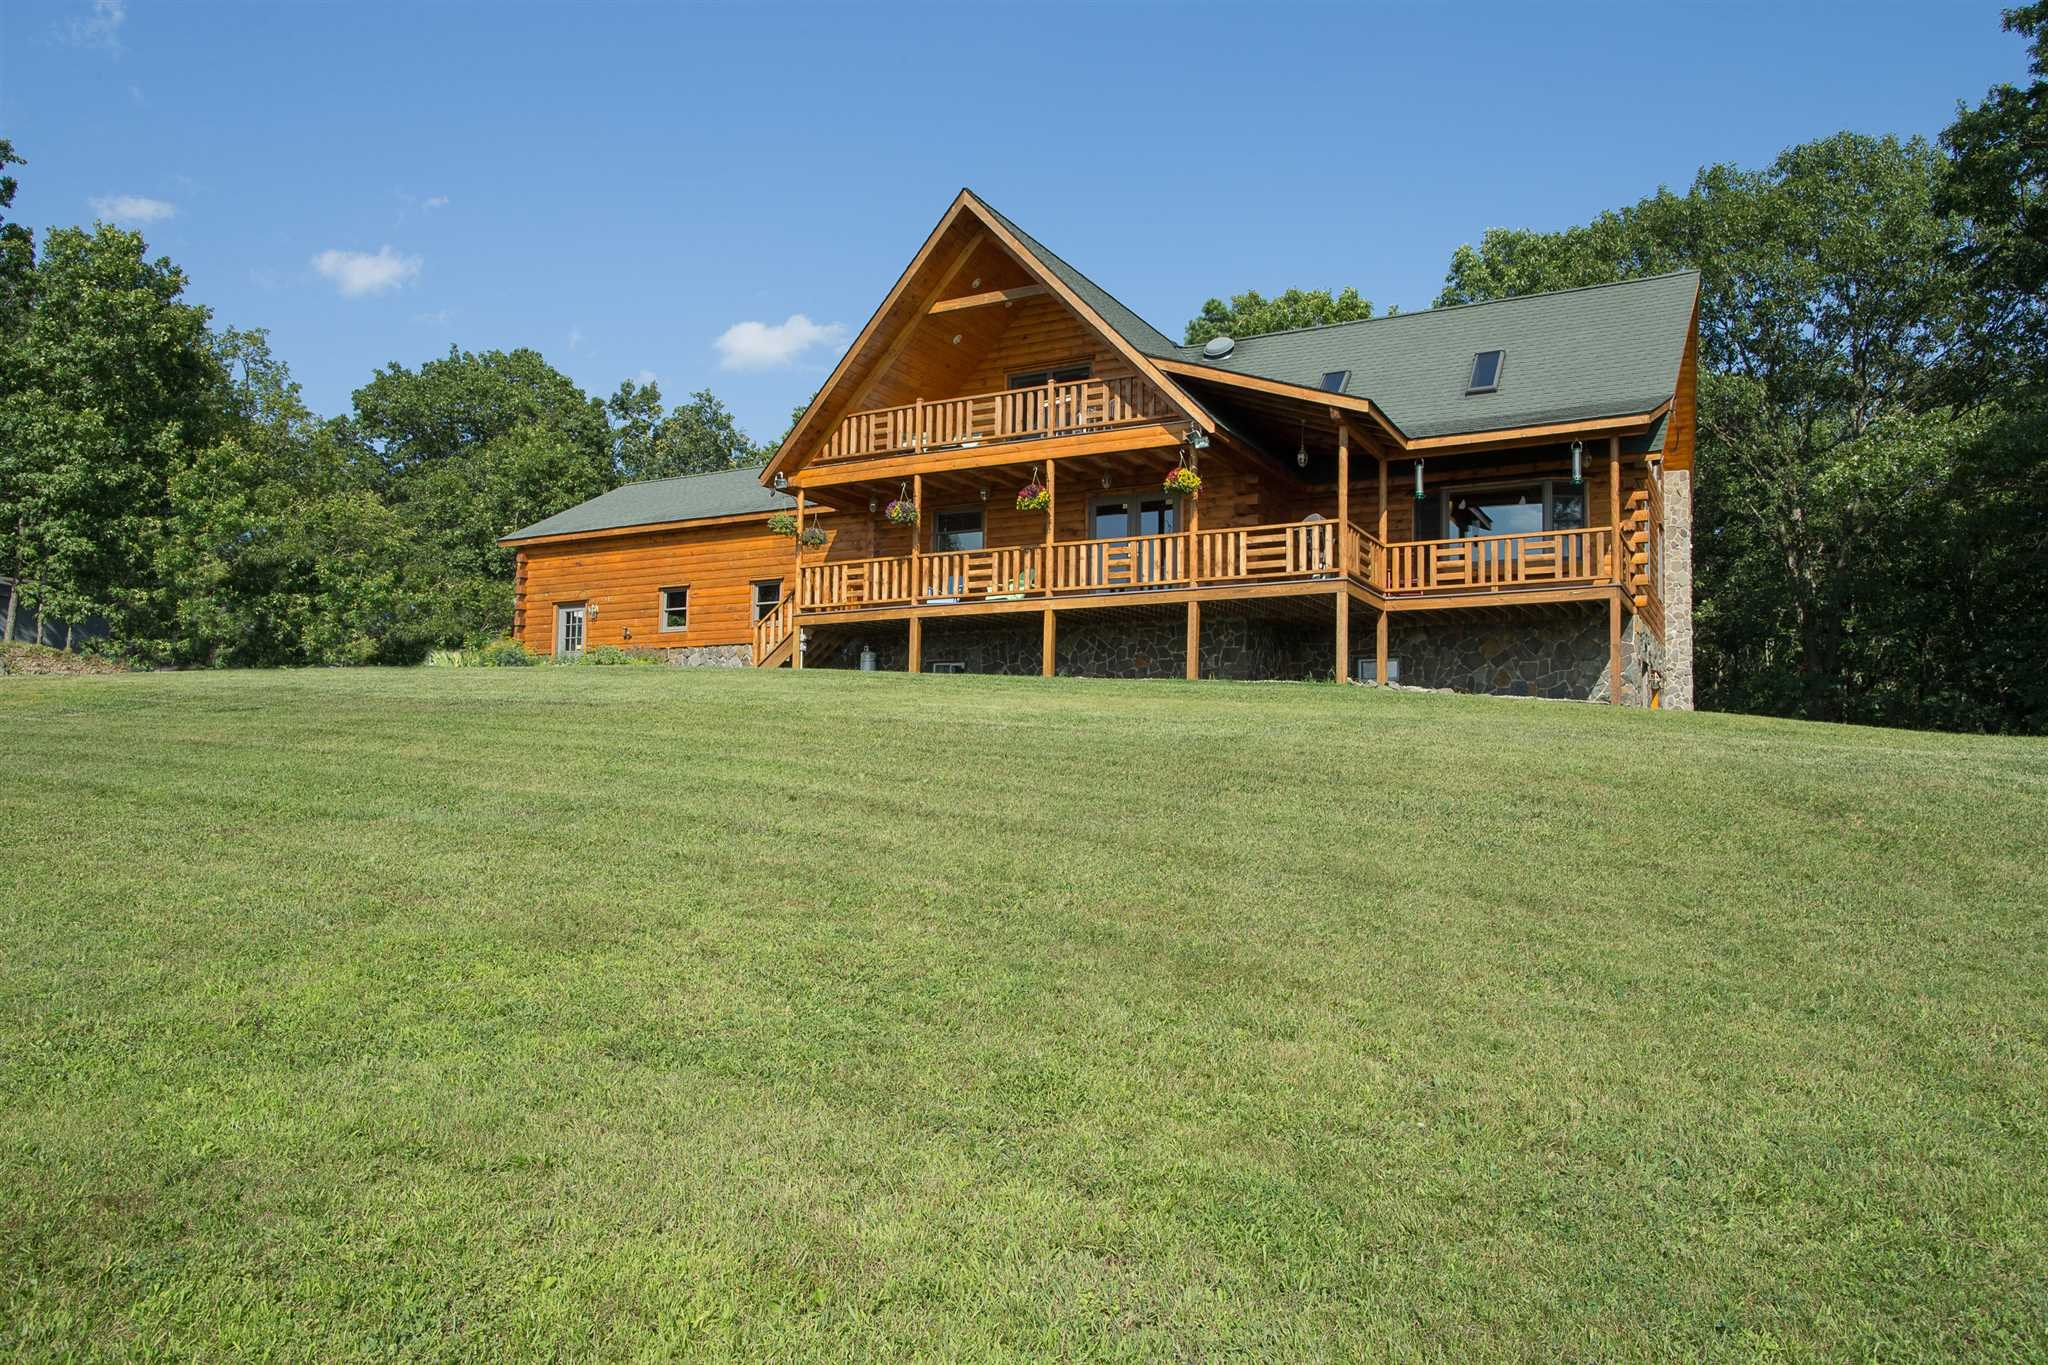 Single Family Home for Sale at 62 TRILLIUM Road 62 TRILLIUM Road Pleasant Valley, New York 12569 United States